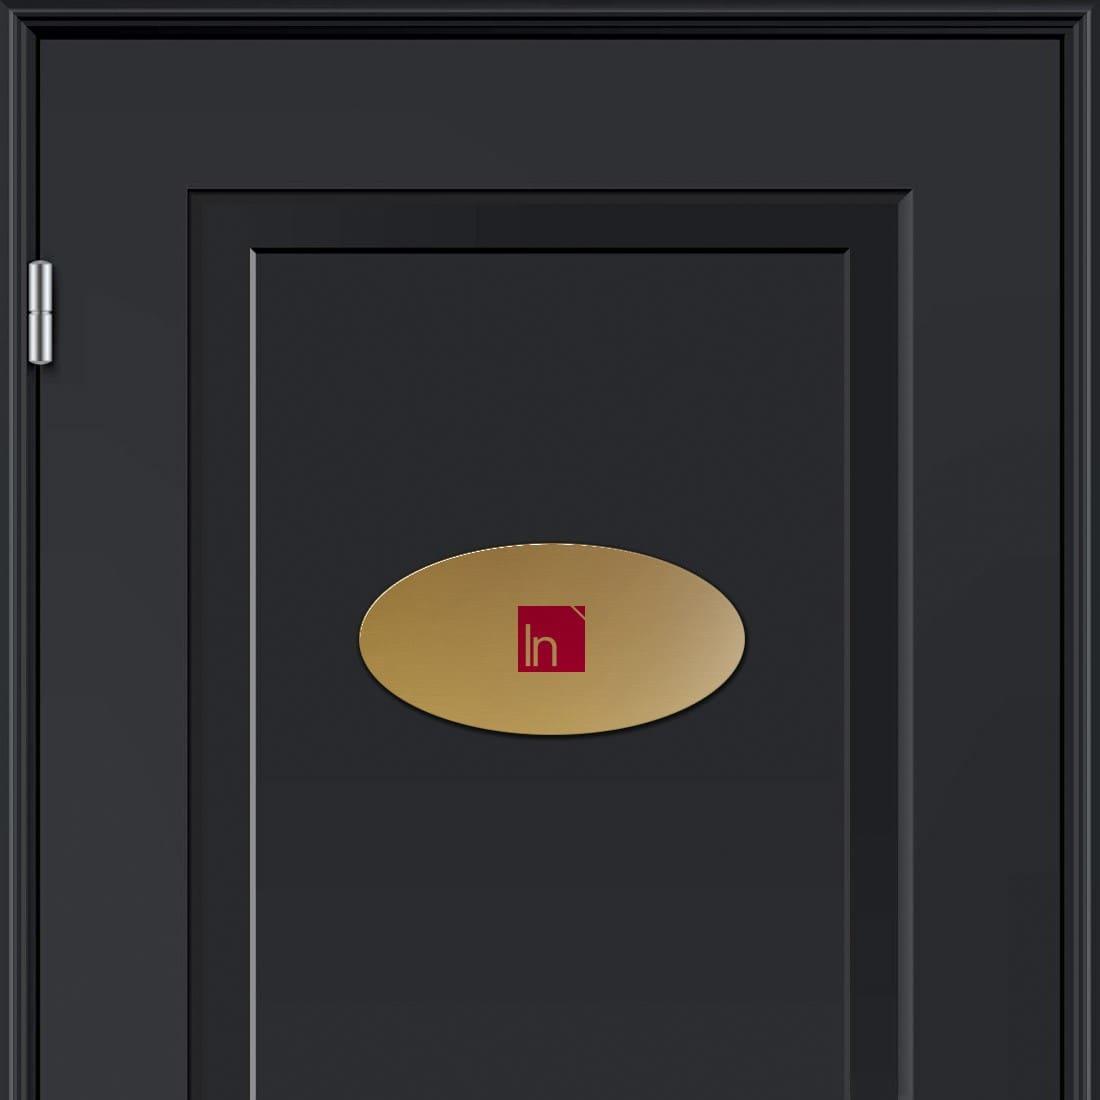 Targhetta alluminio ovale dorata crea le tue targhette - Targhette porta ...